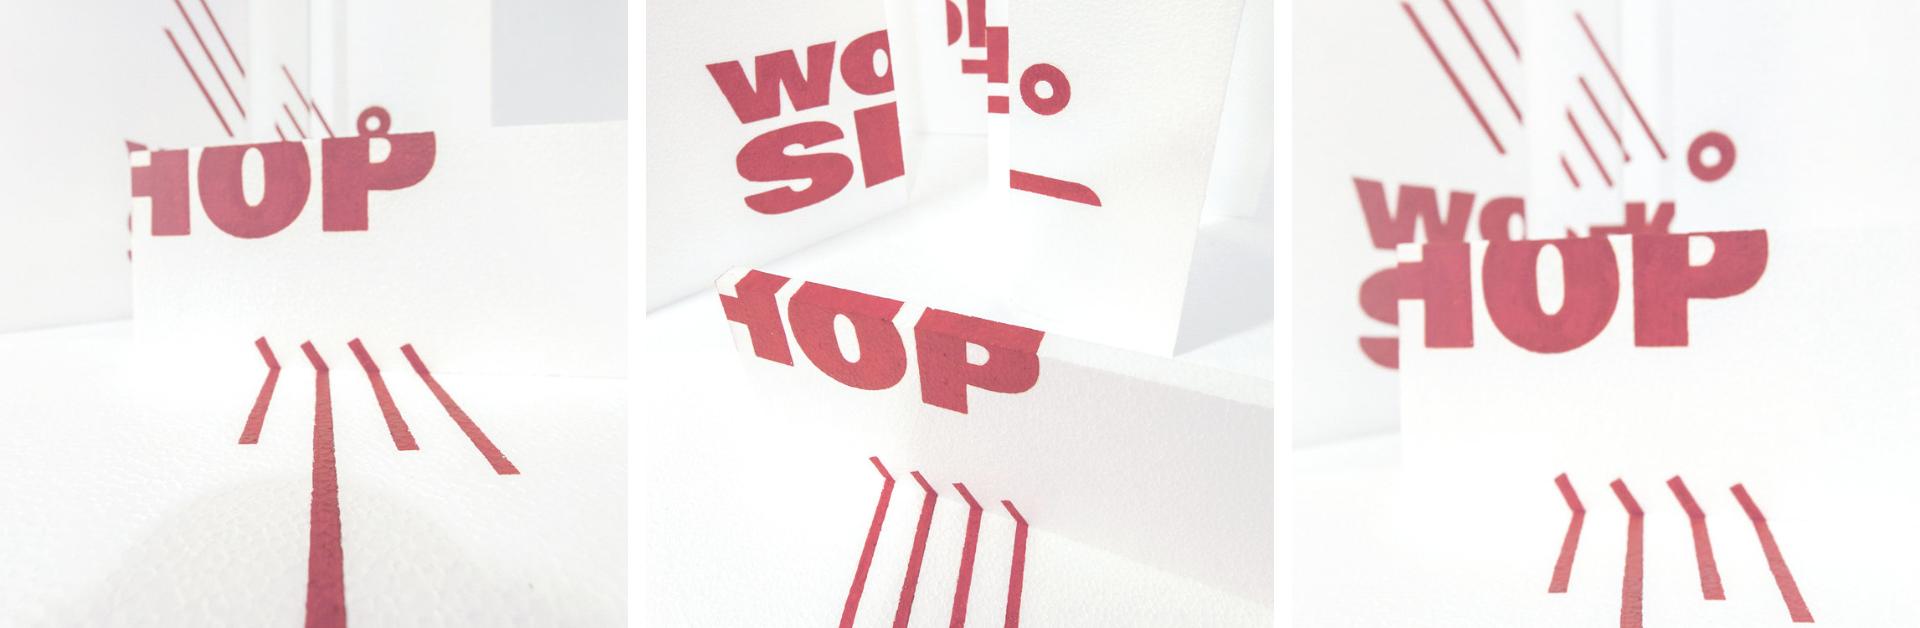 1280px-Workshop-Pontos-de-vista-bonjourmolotov-ESAD-Experimenta-Design-2015-EXD15-Tipografia-Anamórfica-Anamorphic-Typography+670px+details.png